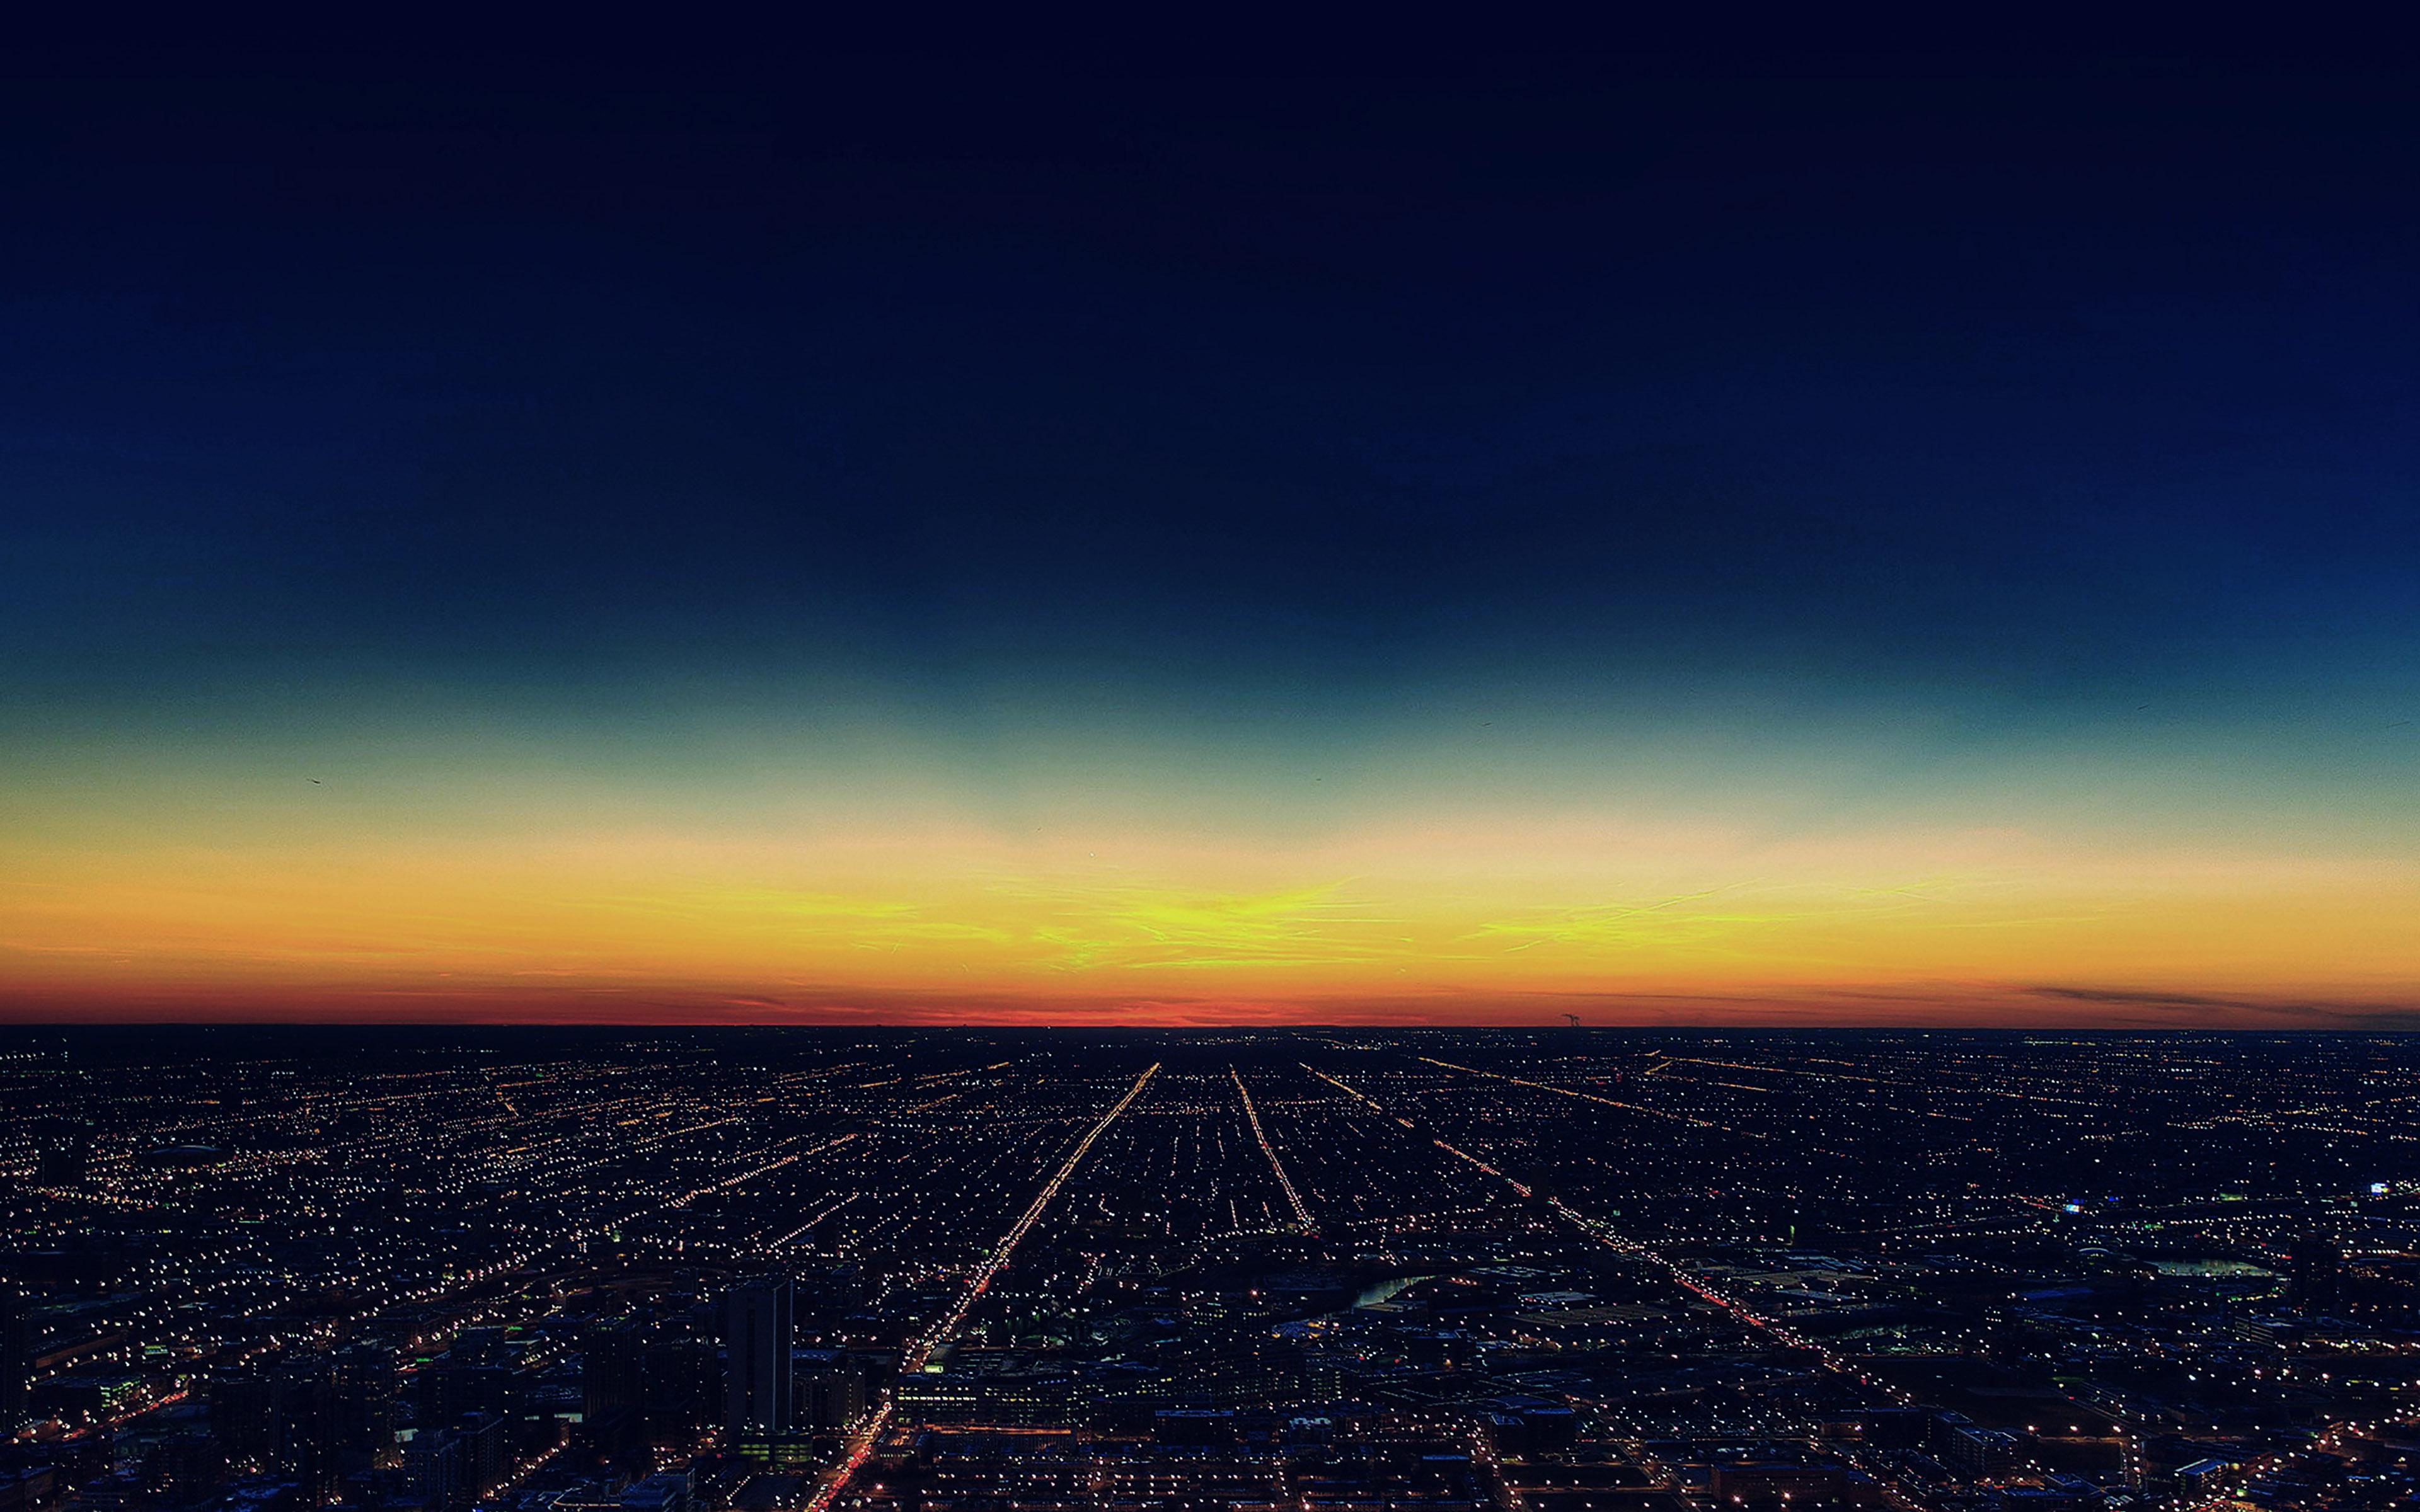 mg31-night-sky-flying-blue-sunset-city-wallpaper